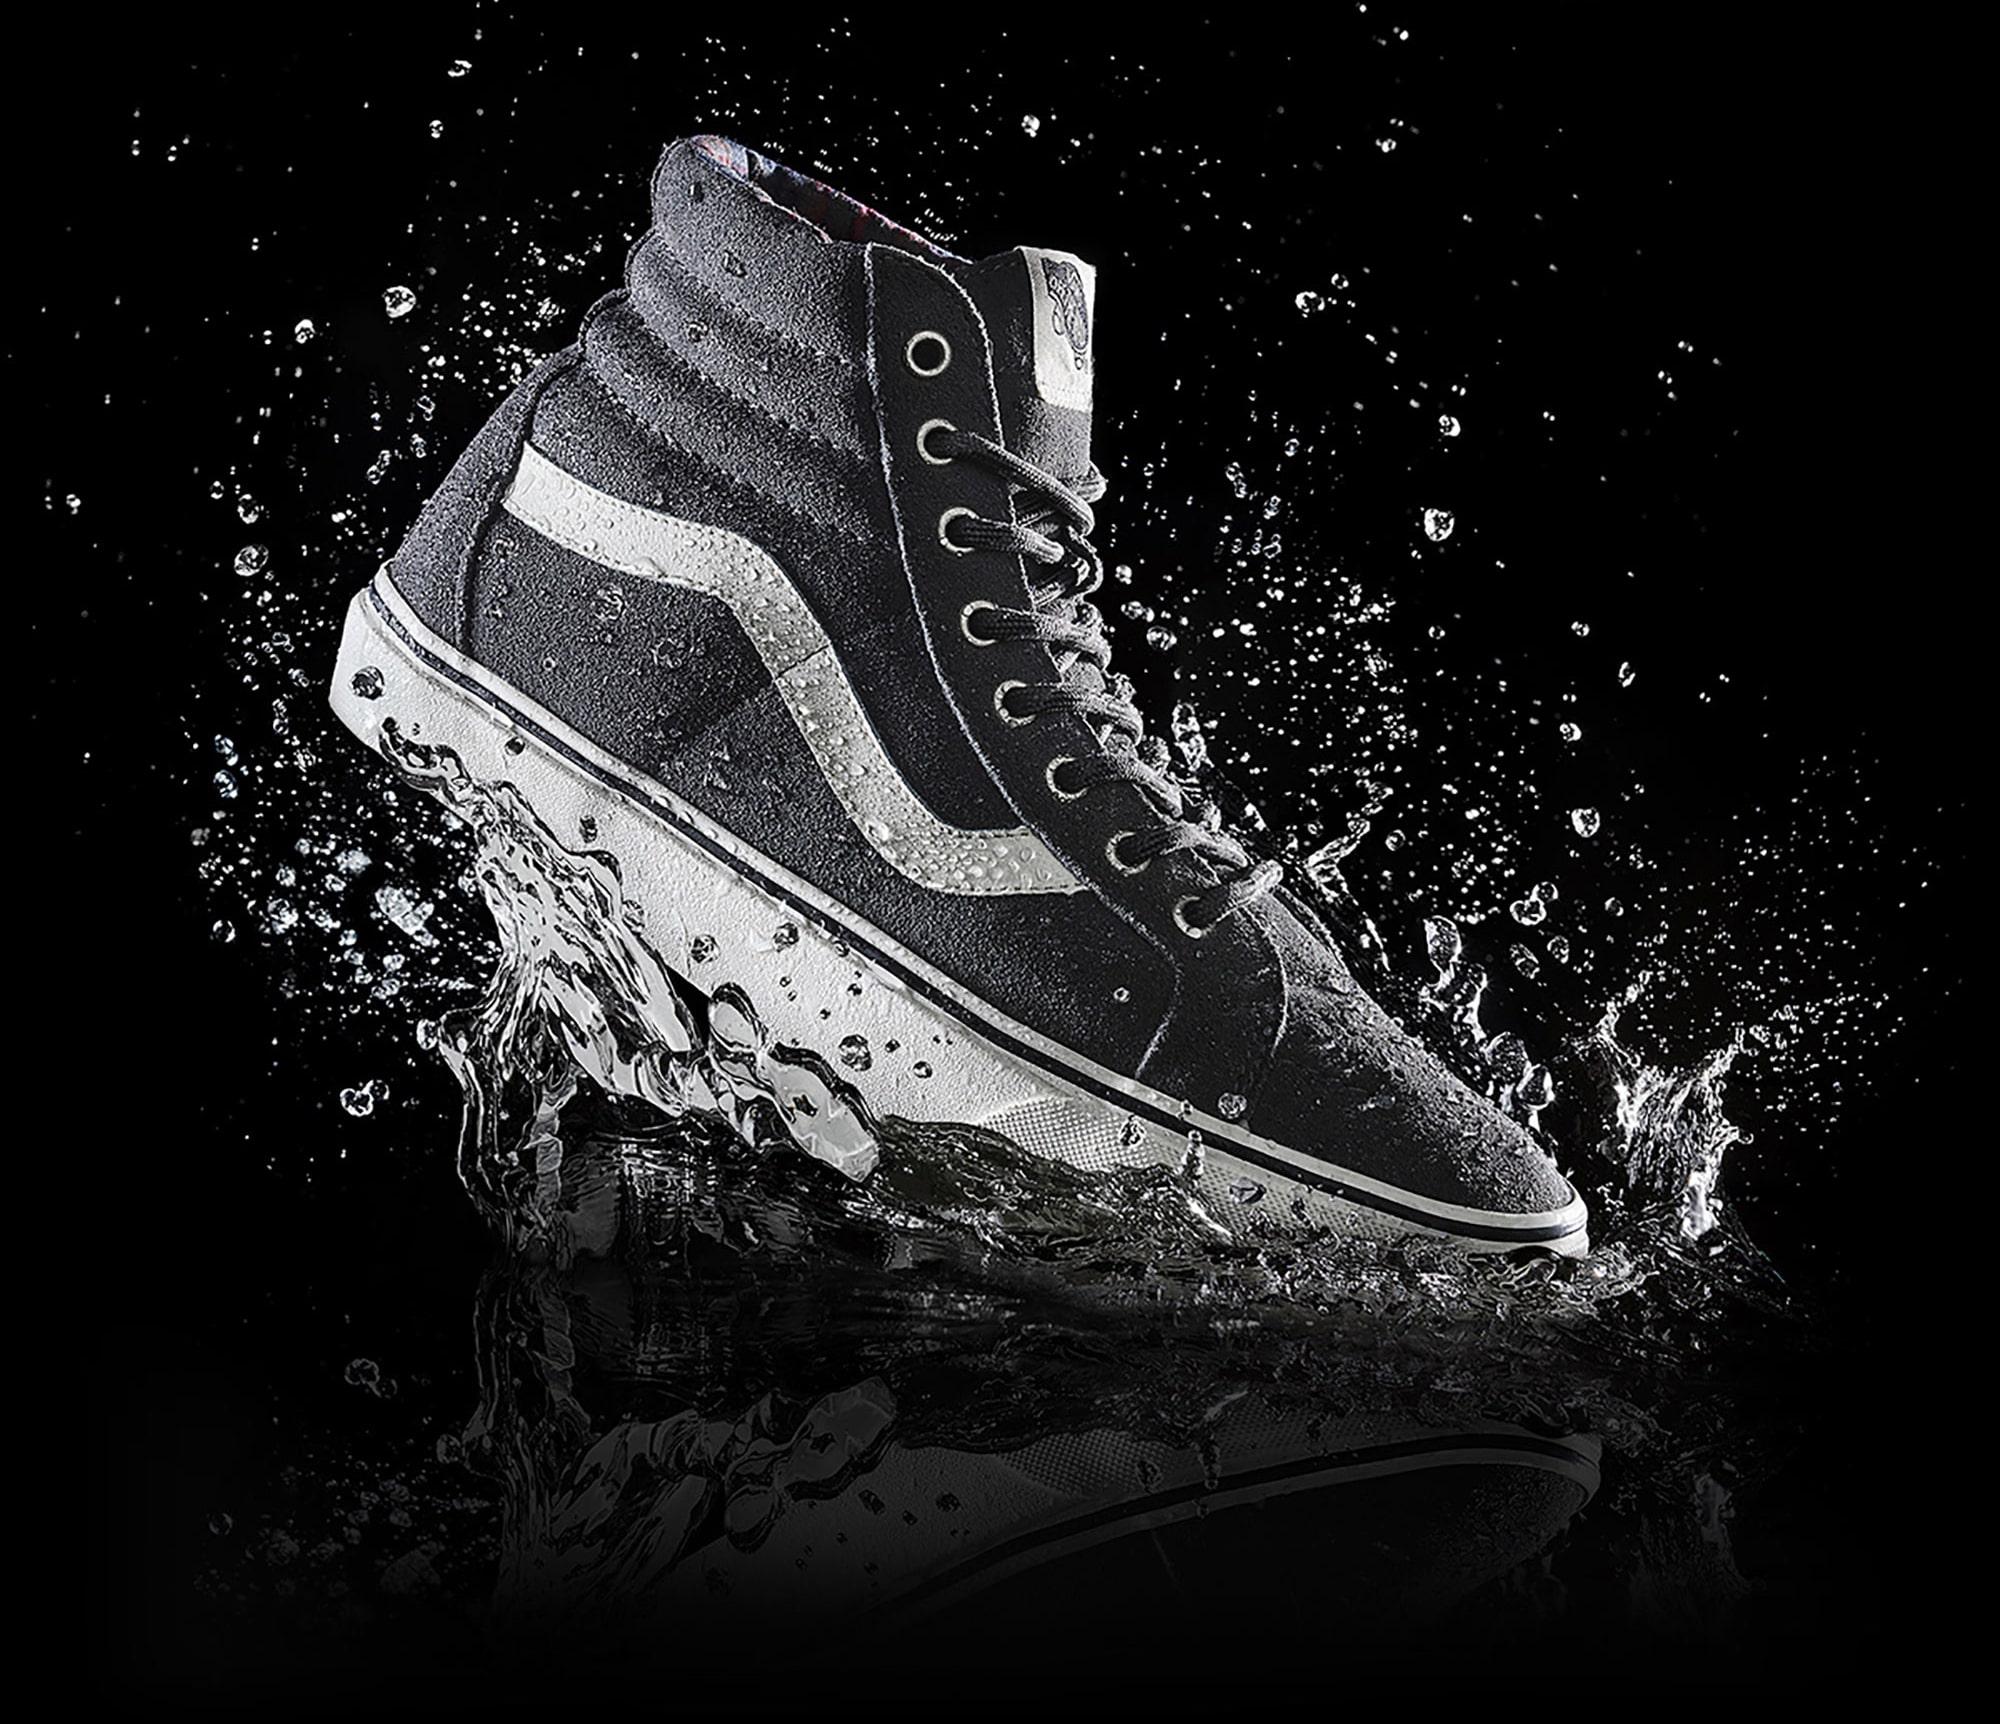 Balck Shoes Water Still Life Shot for Vans by Fotografando